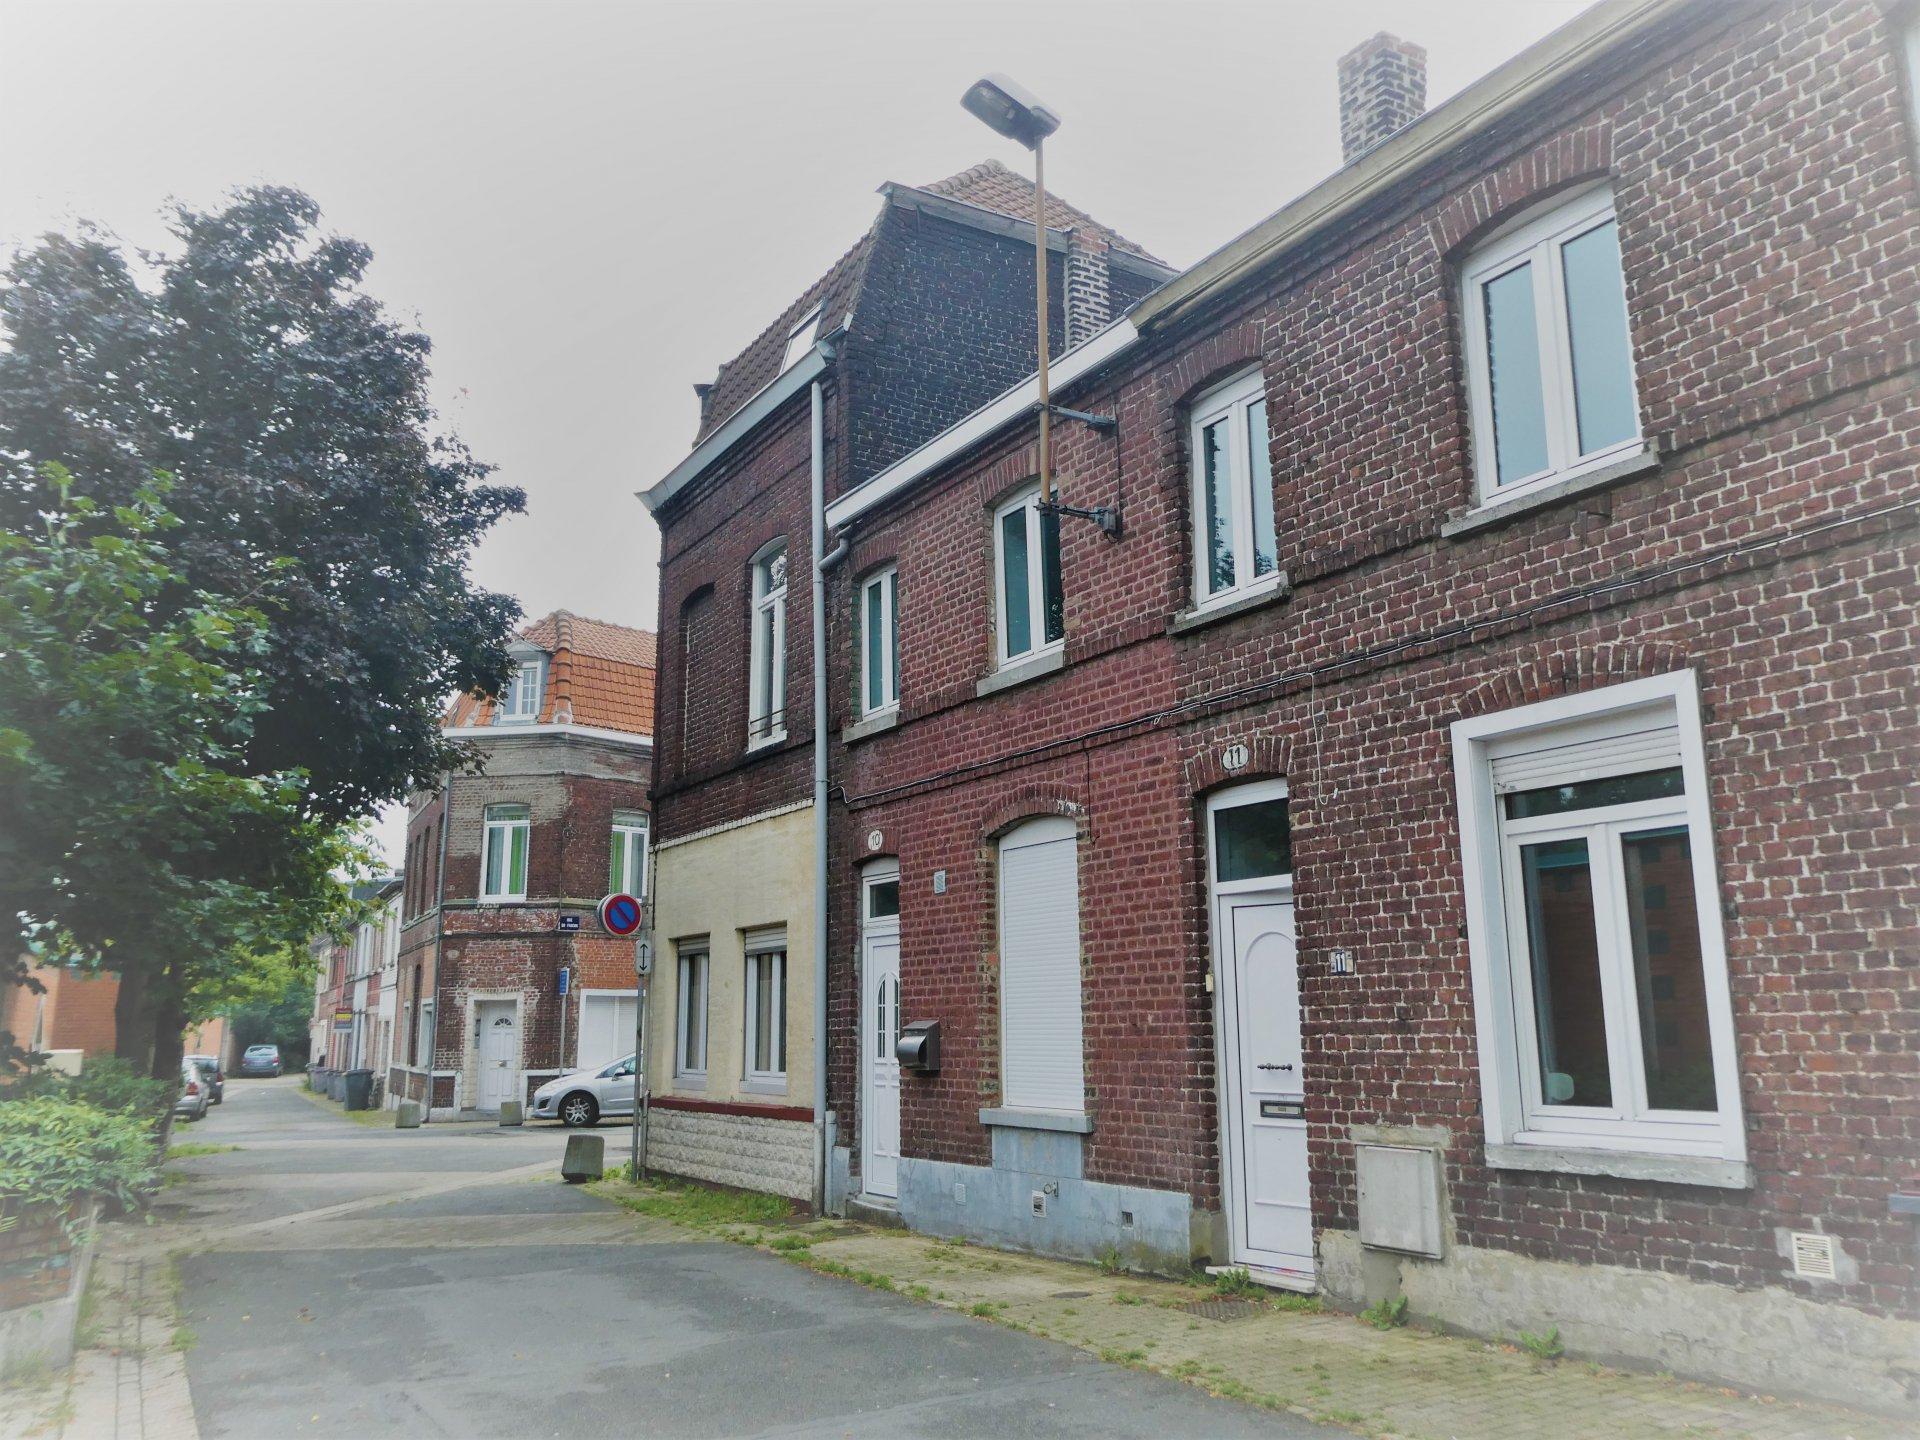 EXCLU Tourcoing- RENTABILITE 9,5%